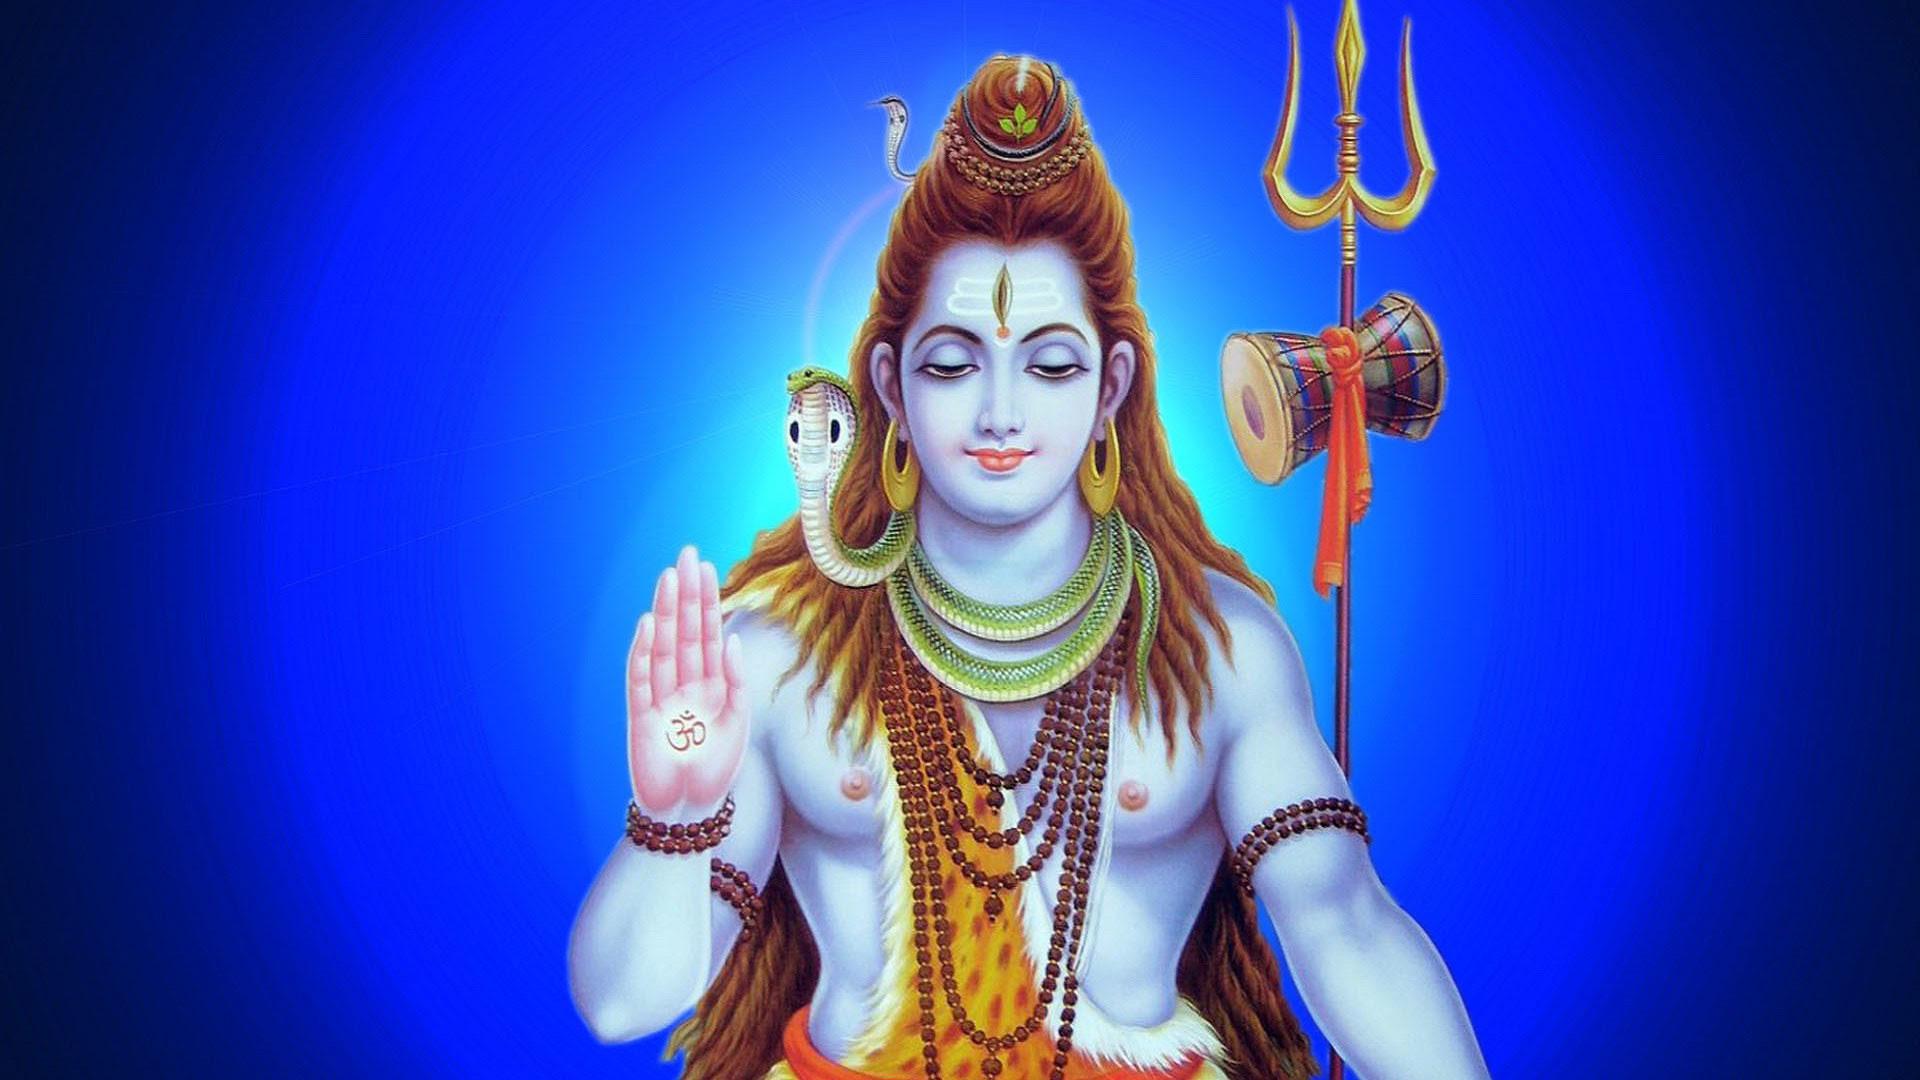 4k Wallpaper High Resolution Modern Shiva Wallpaper Lord Shiva Hd Images